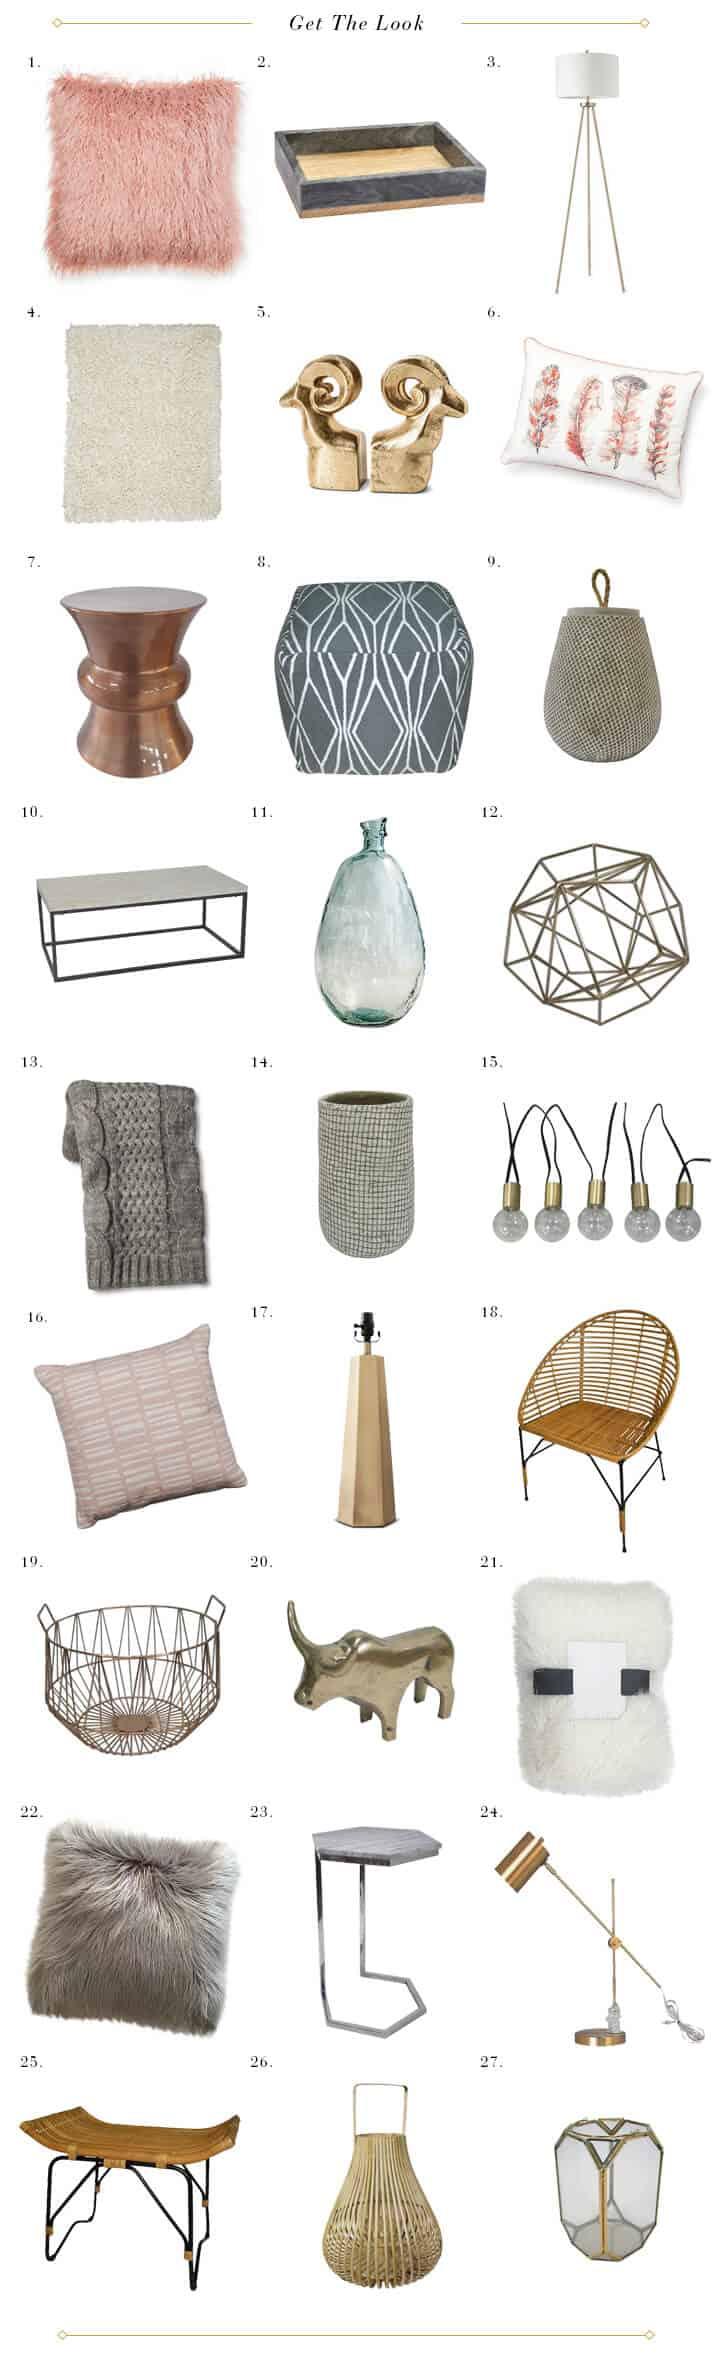 Target_Living_Room_2016_Get_The_Look